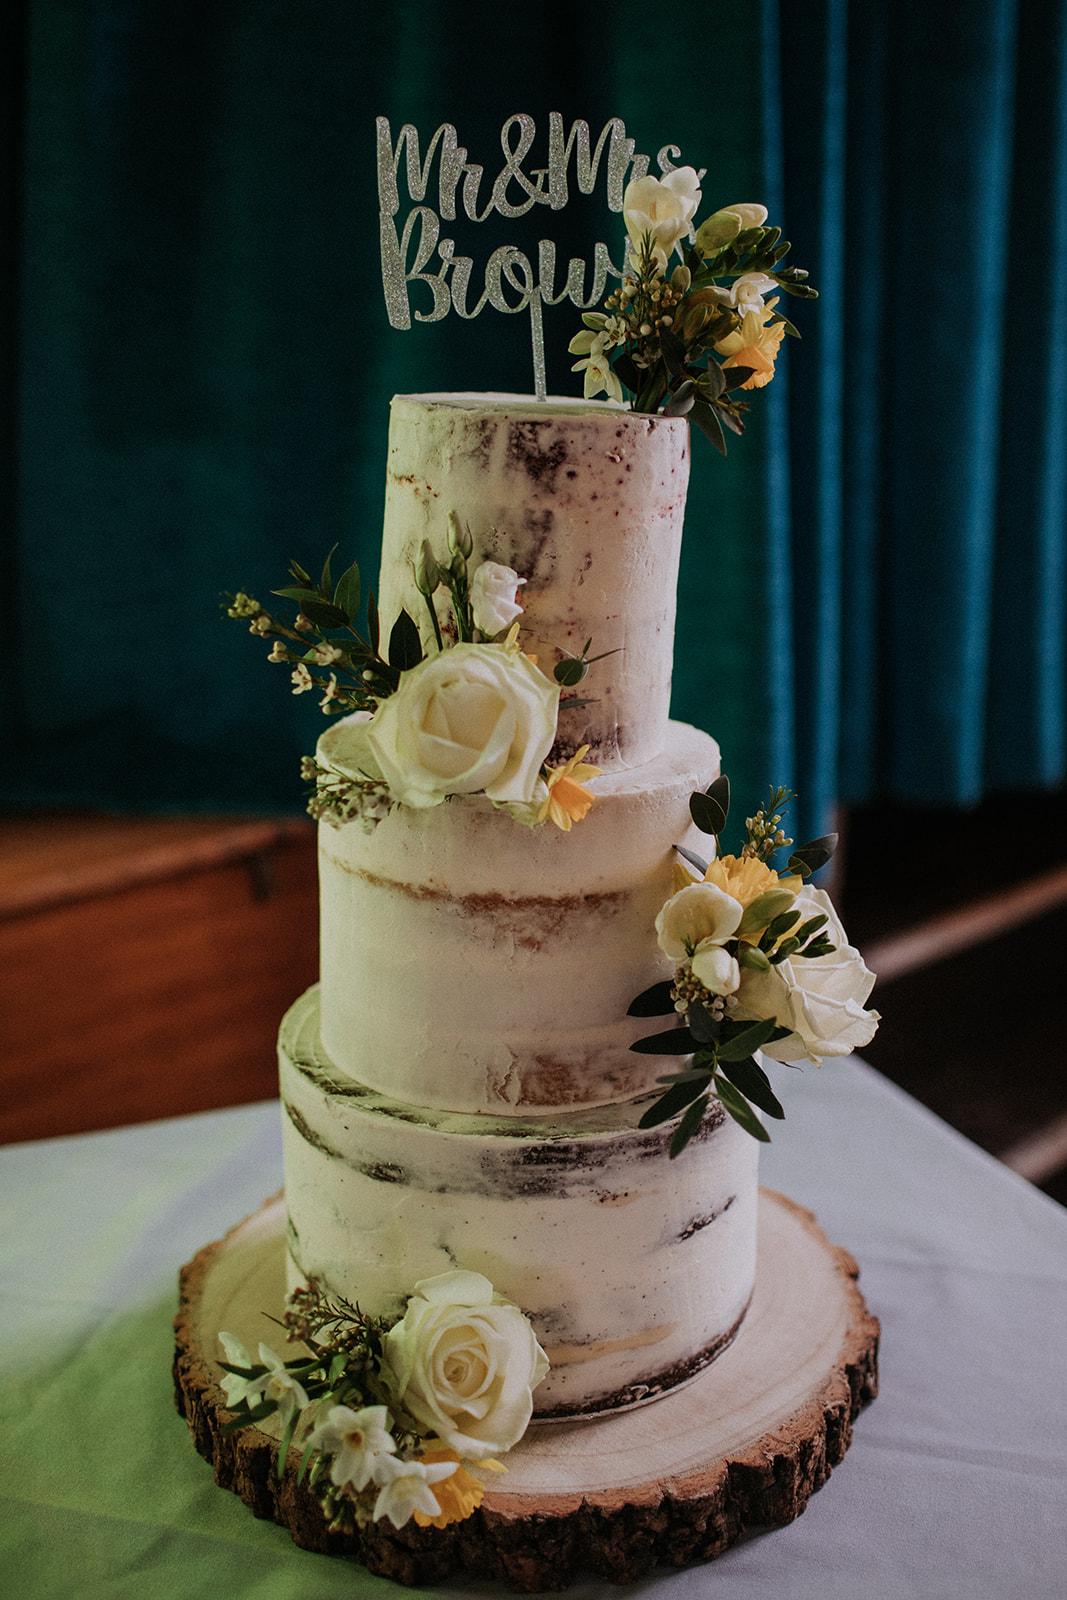 rustic wedding cake - spring wedding cake - rutland wedding - fun wedding - east midlands wedding planner - Leicestershire wedding planning - nottingham wedding planning